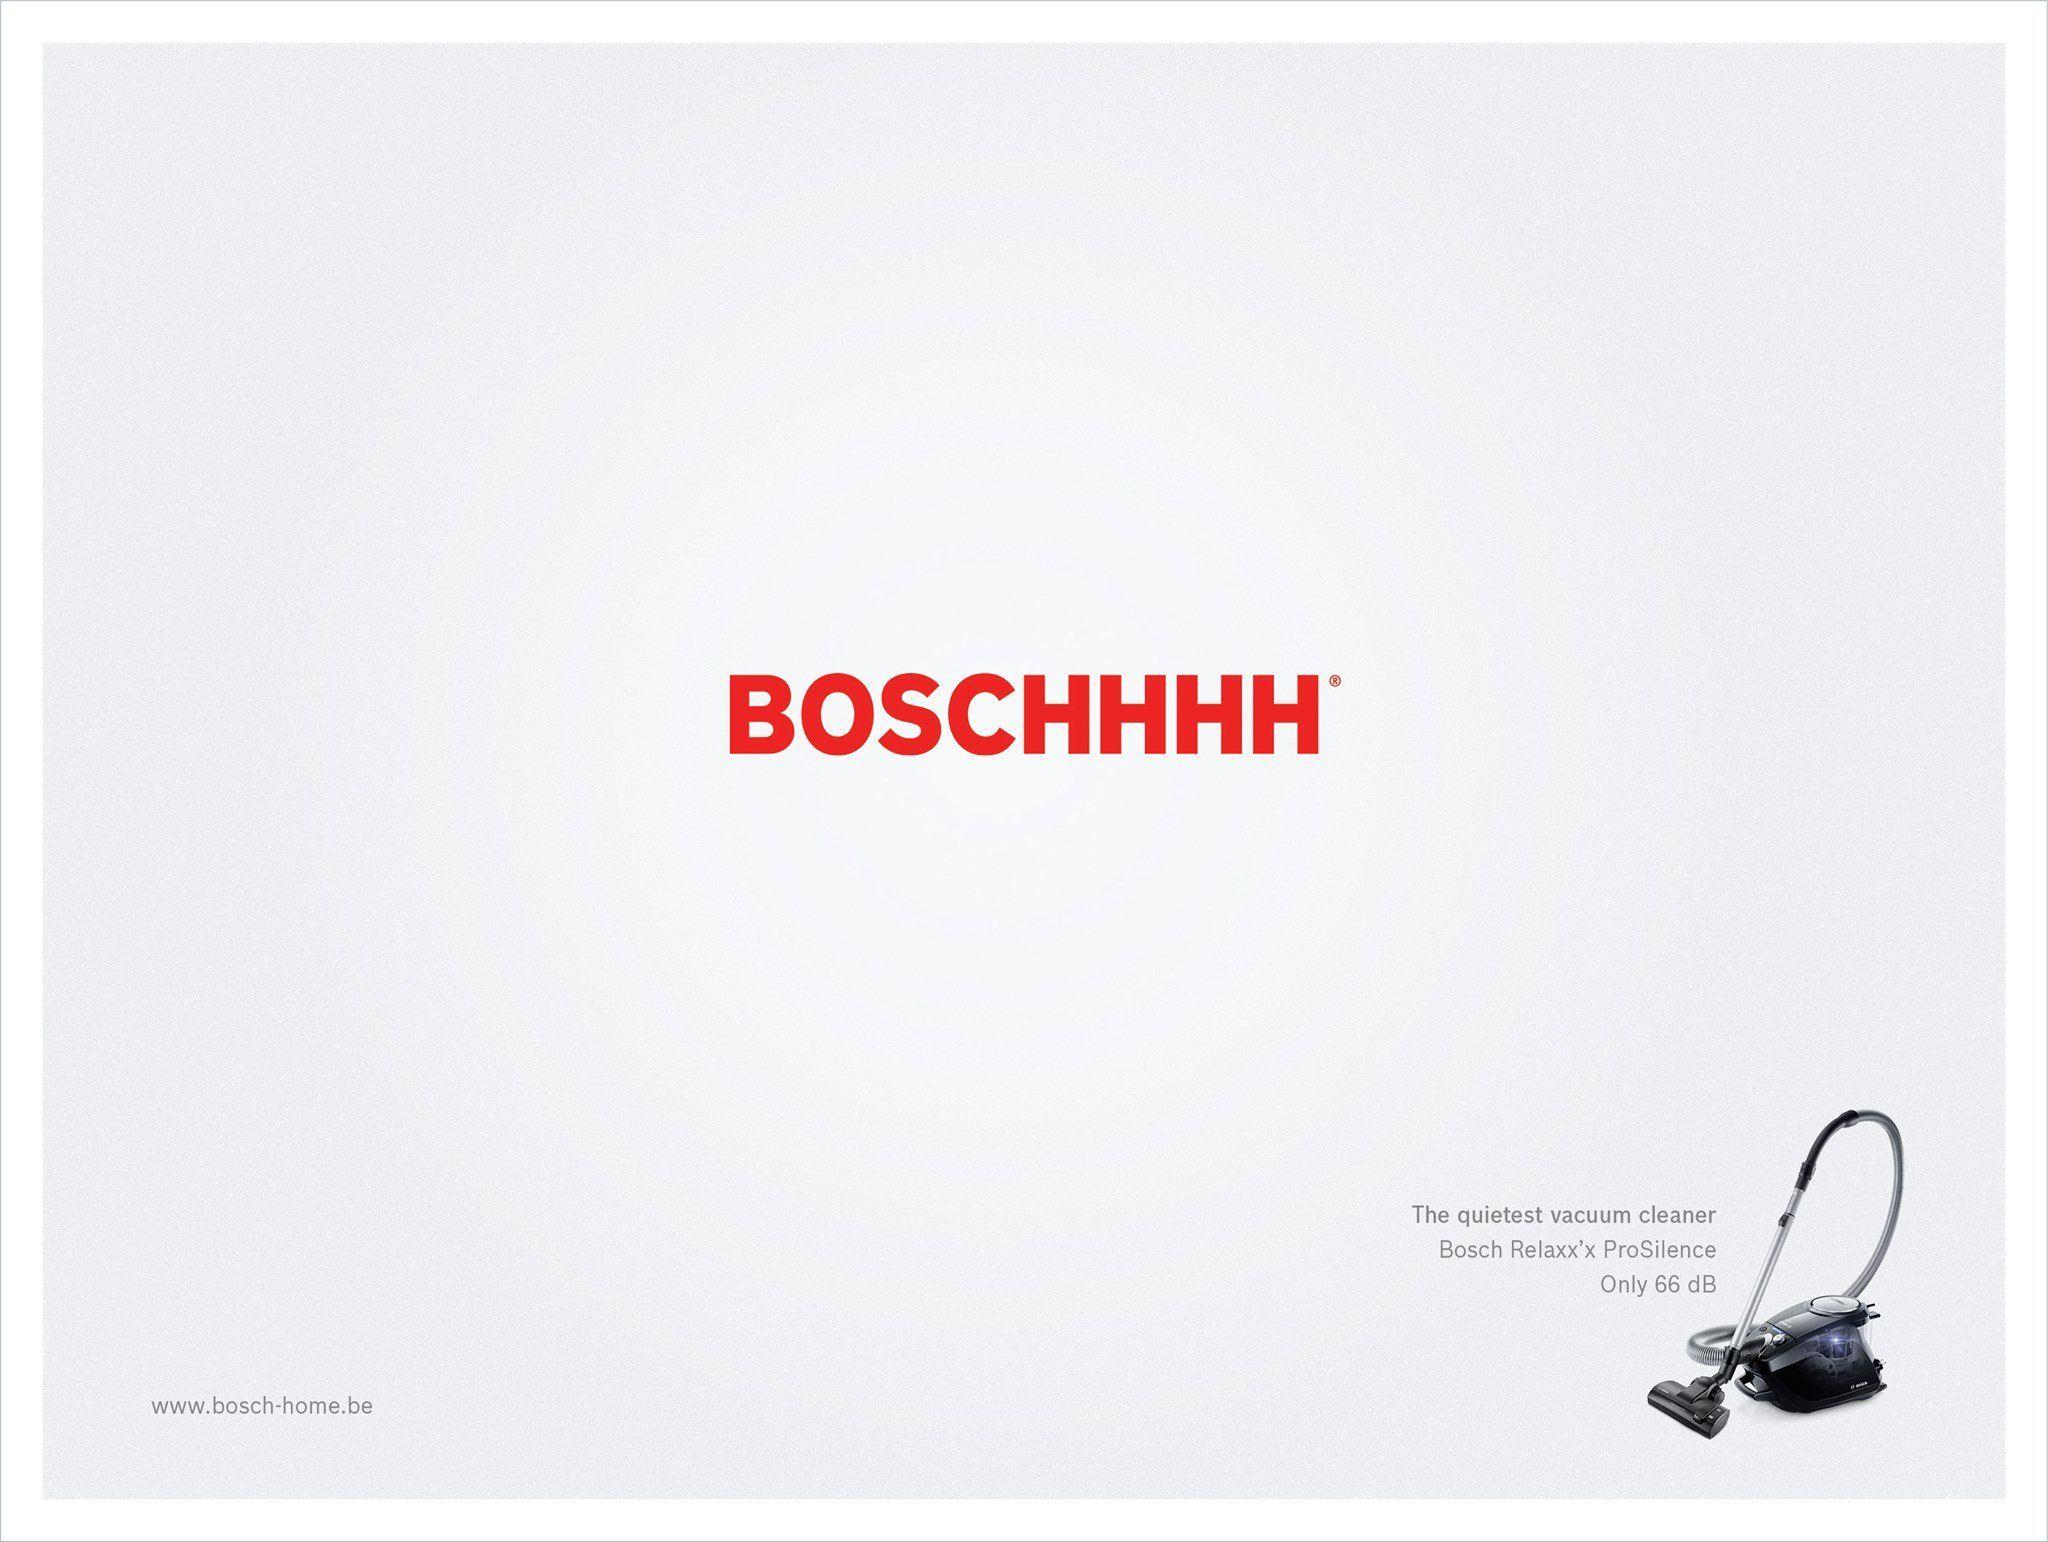 Bosch Relax Silence Ad Facebook Creative Marketing Campaign Print Ads Bosch